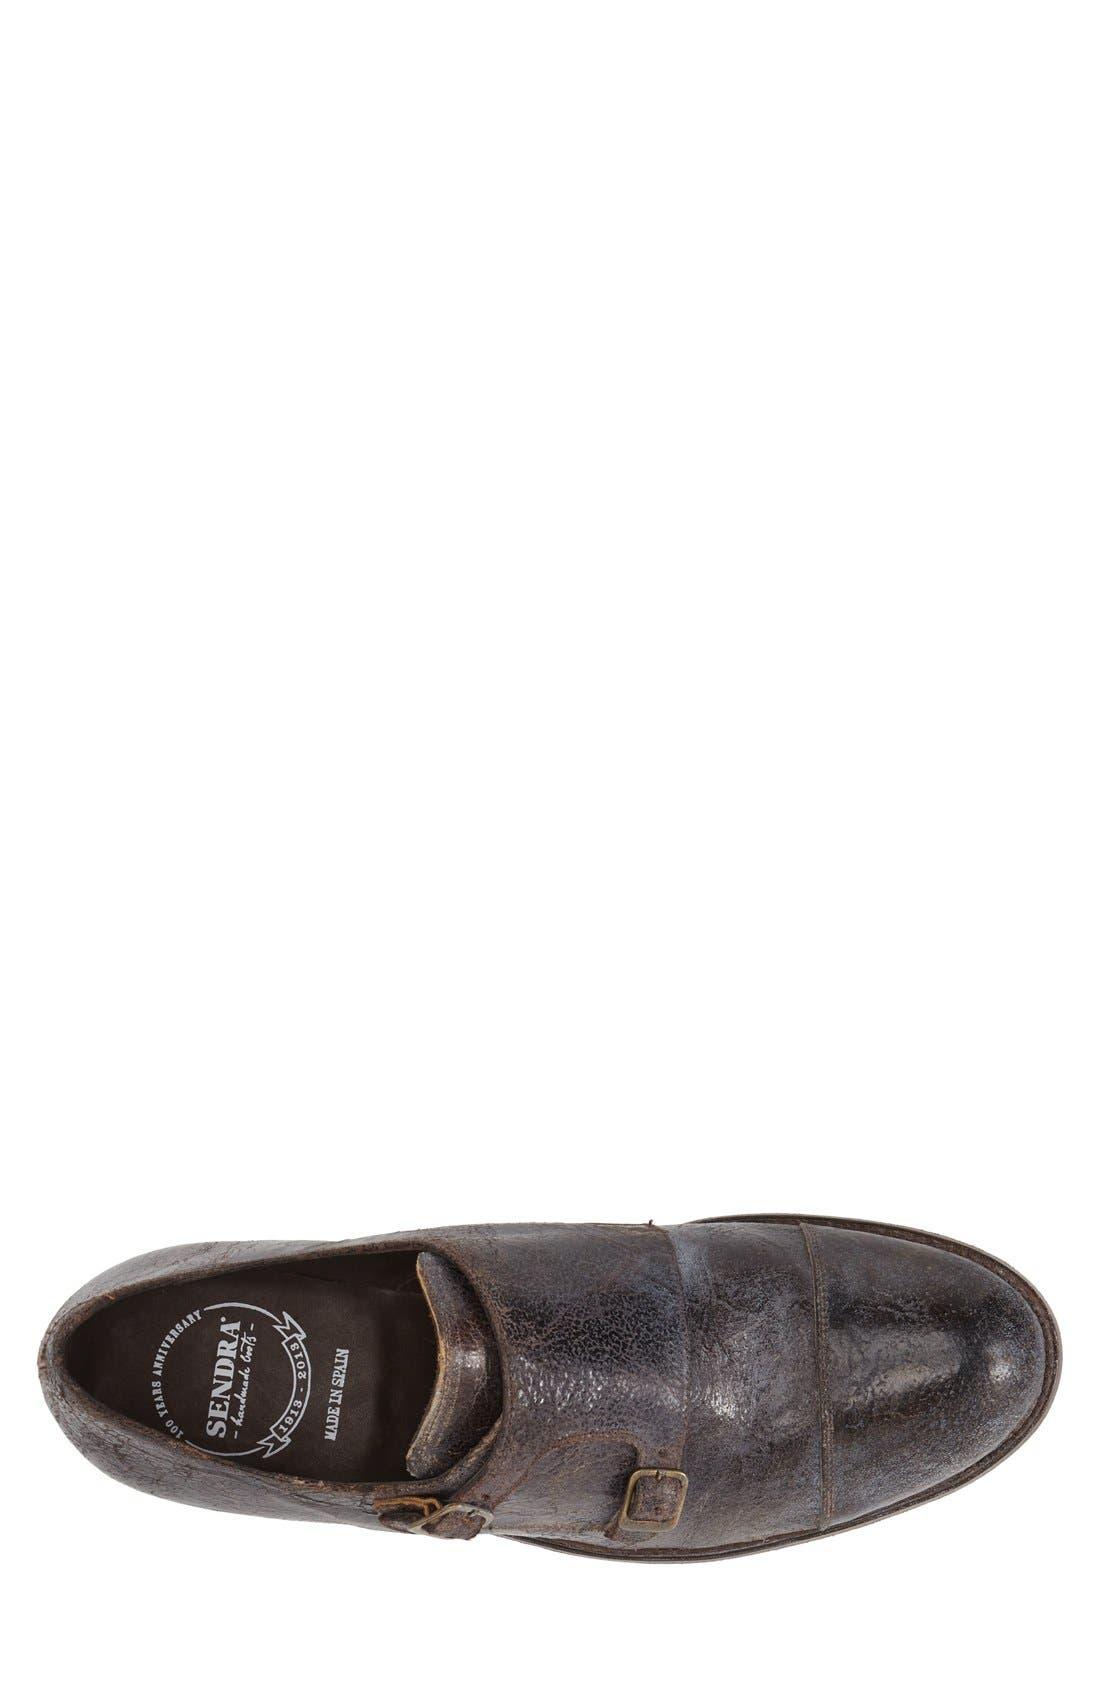 Boots 'Friar Tuk' Double Monk Strap Shoe,                             Alternate thumbnail 3, color,                             200